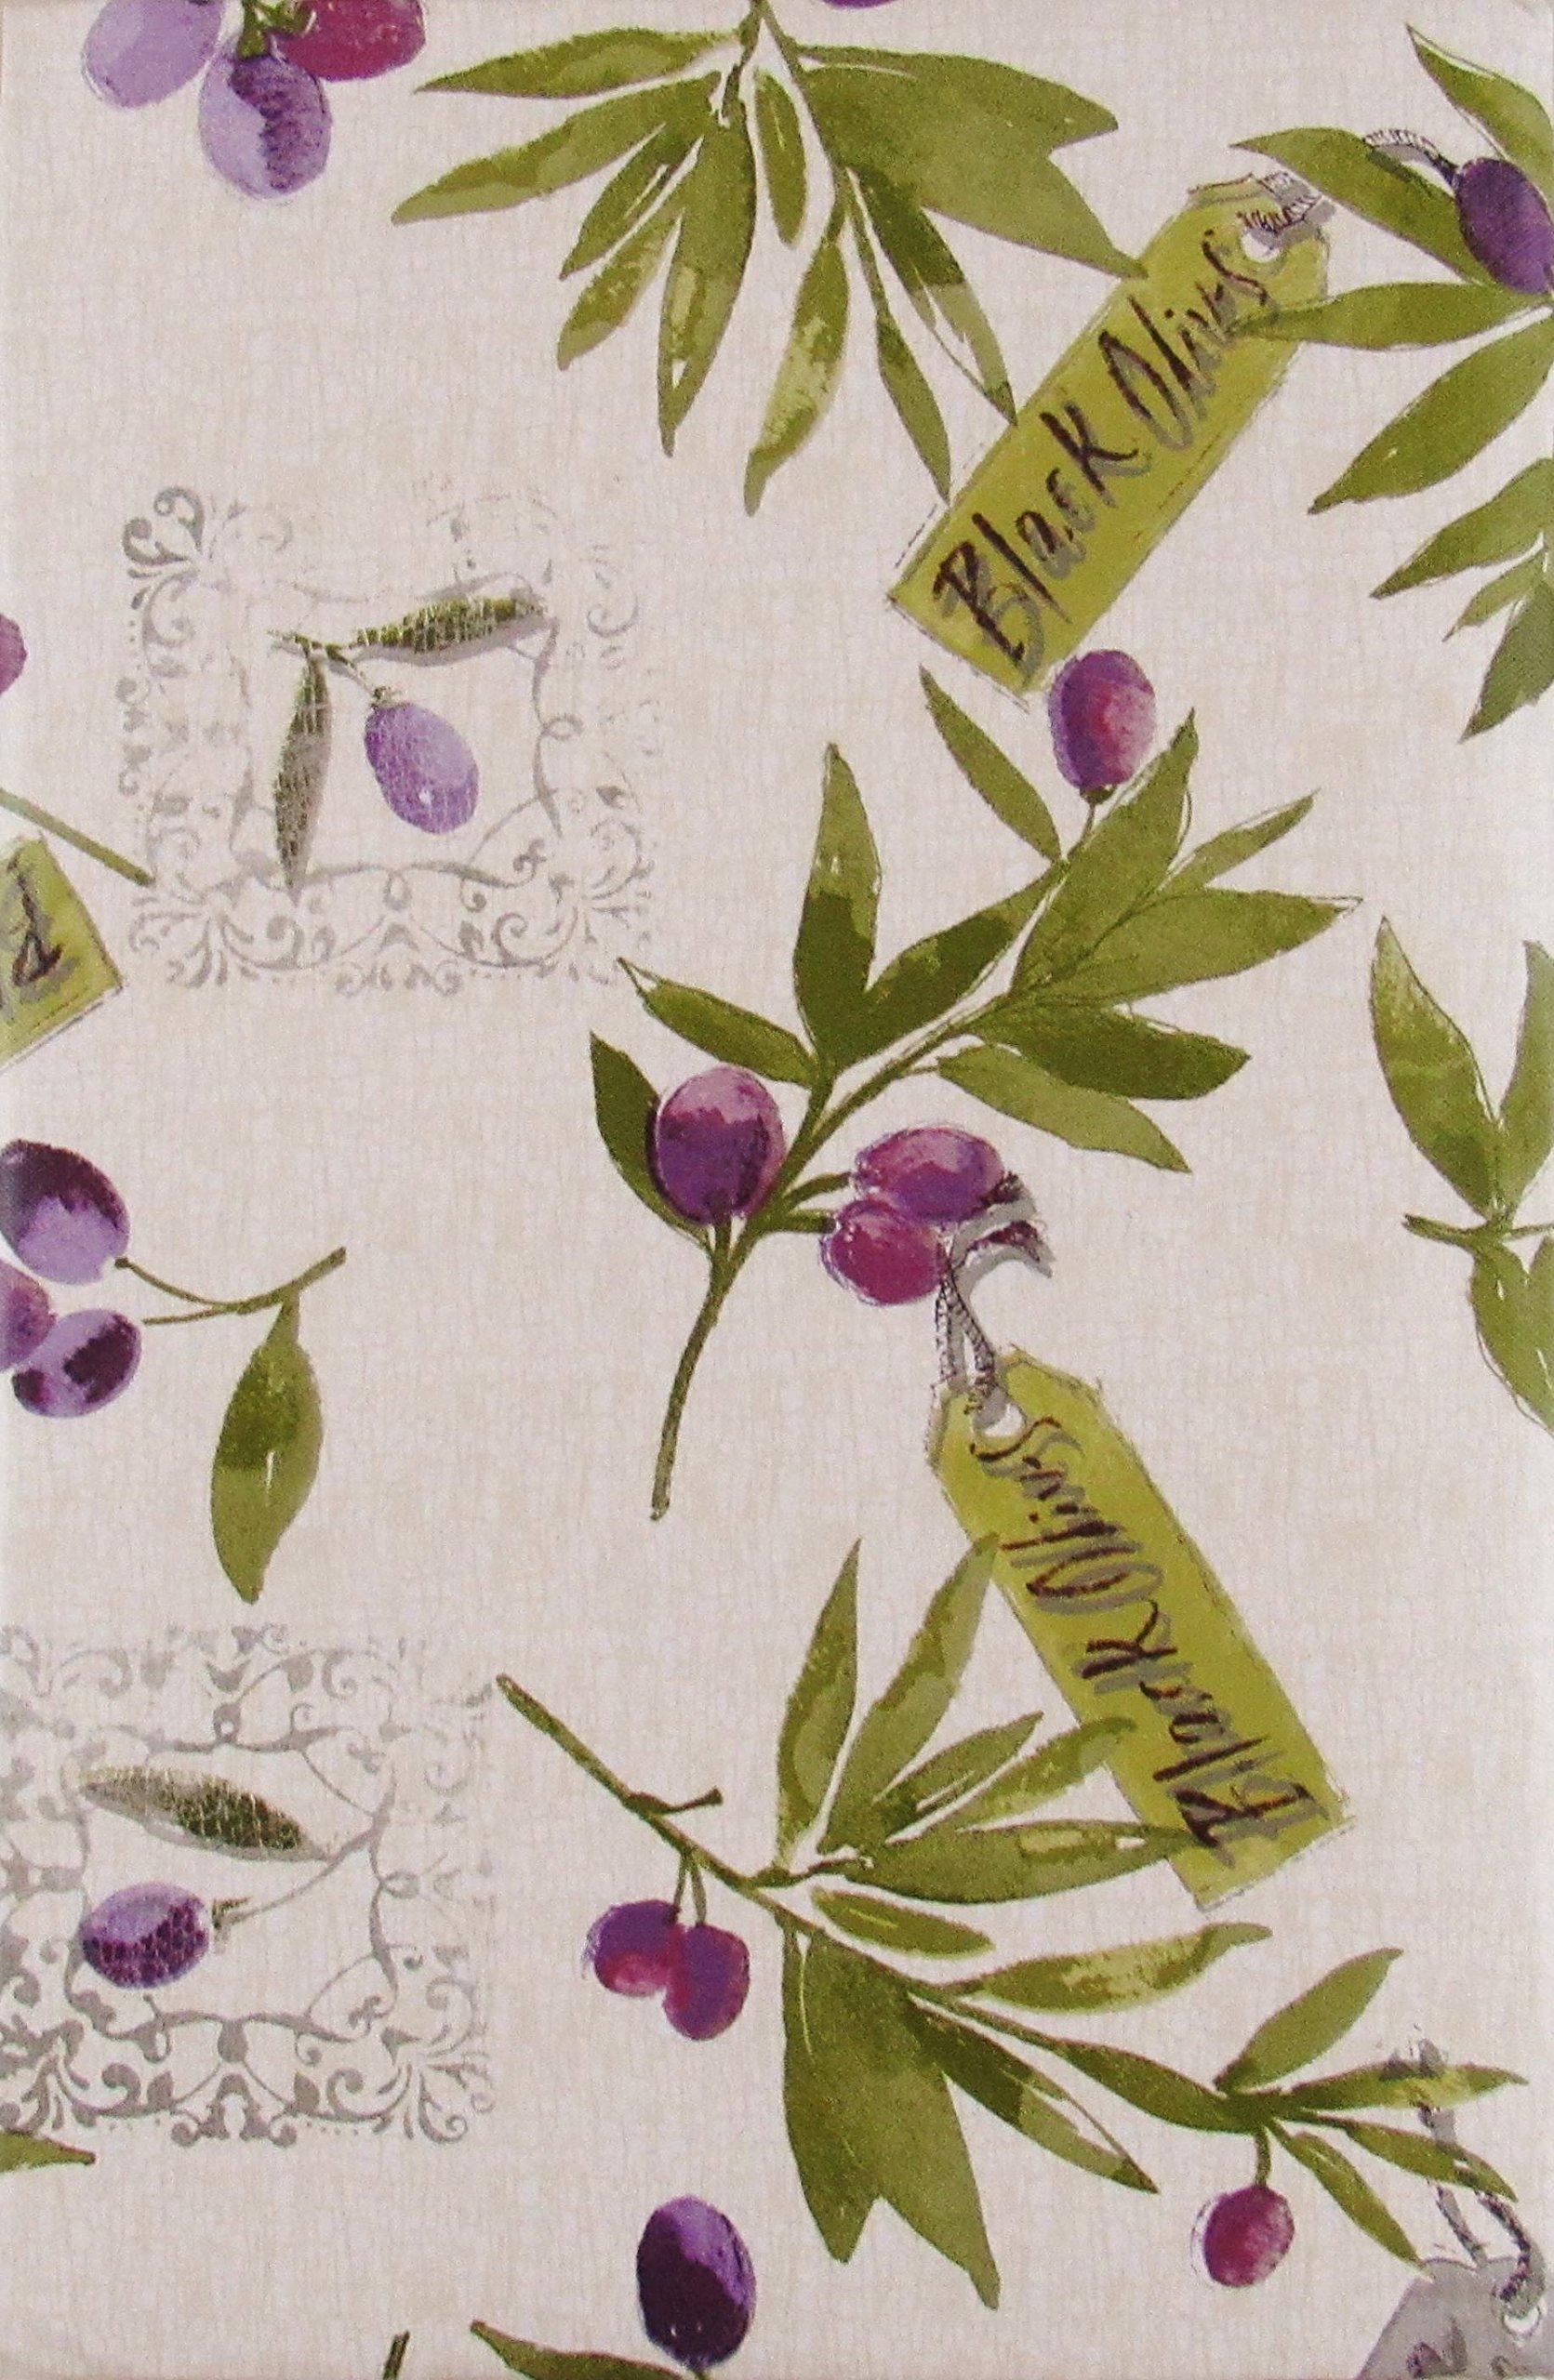 52 x 70 Oblong Fresh Herbs Collage Vinyl Flannel BackTablecloths